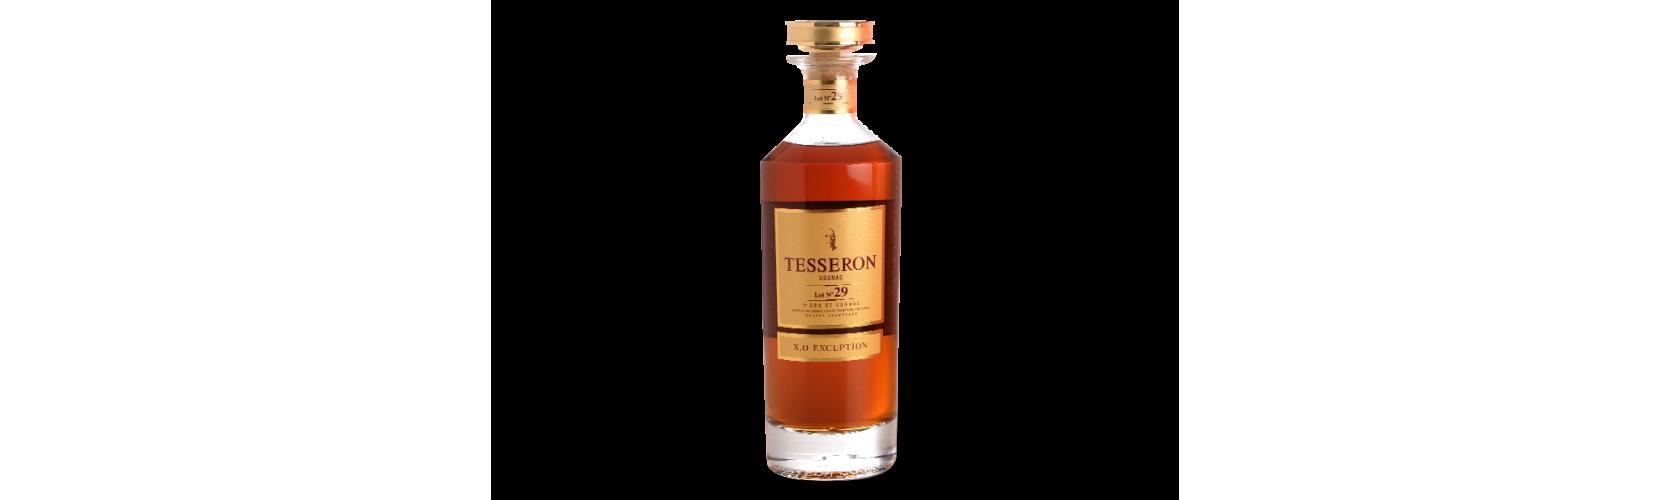 "Cognac TESSERON, Grande Champagne ""LOT N°29 XO PERFECTION"""